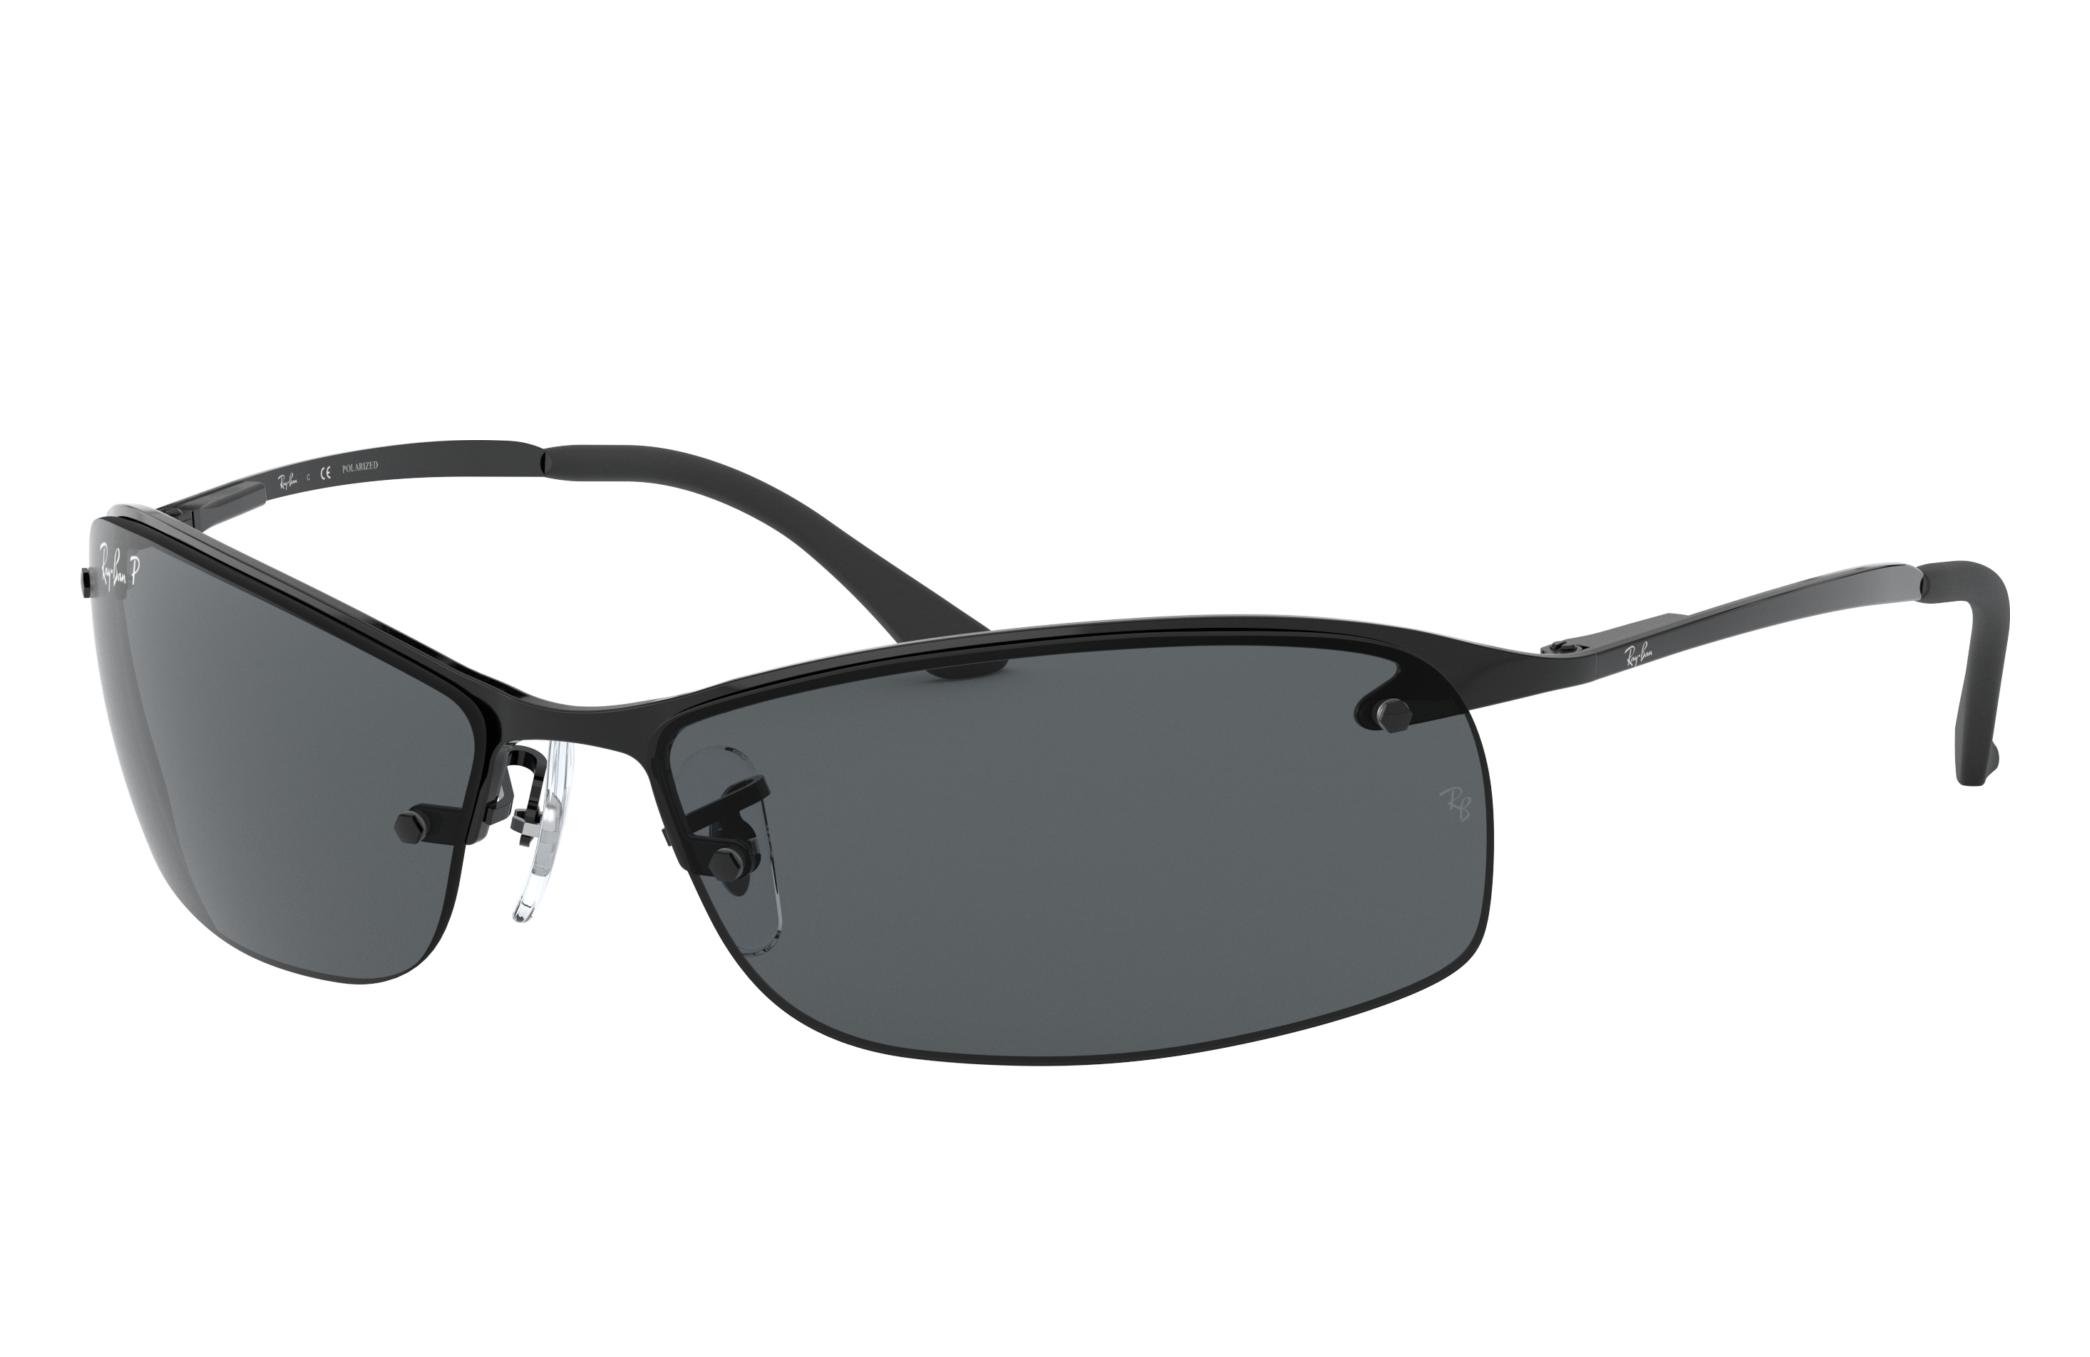 Ray-Ban Rb3183 Black, Polarized Gray Lenses - RB3183